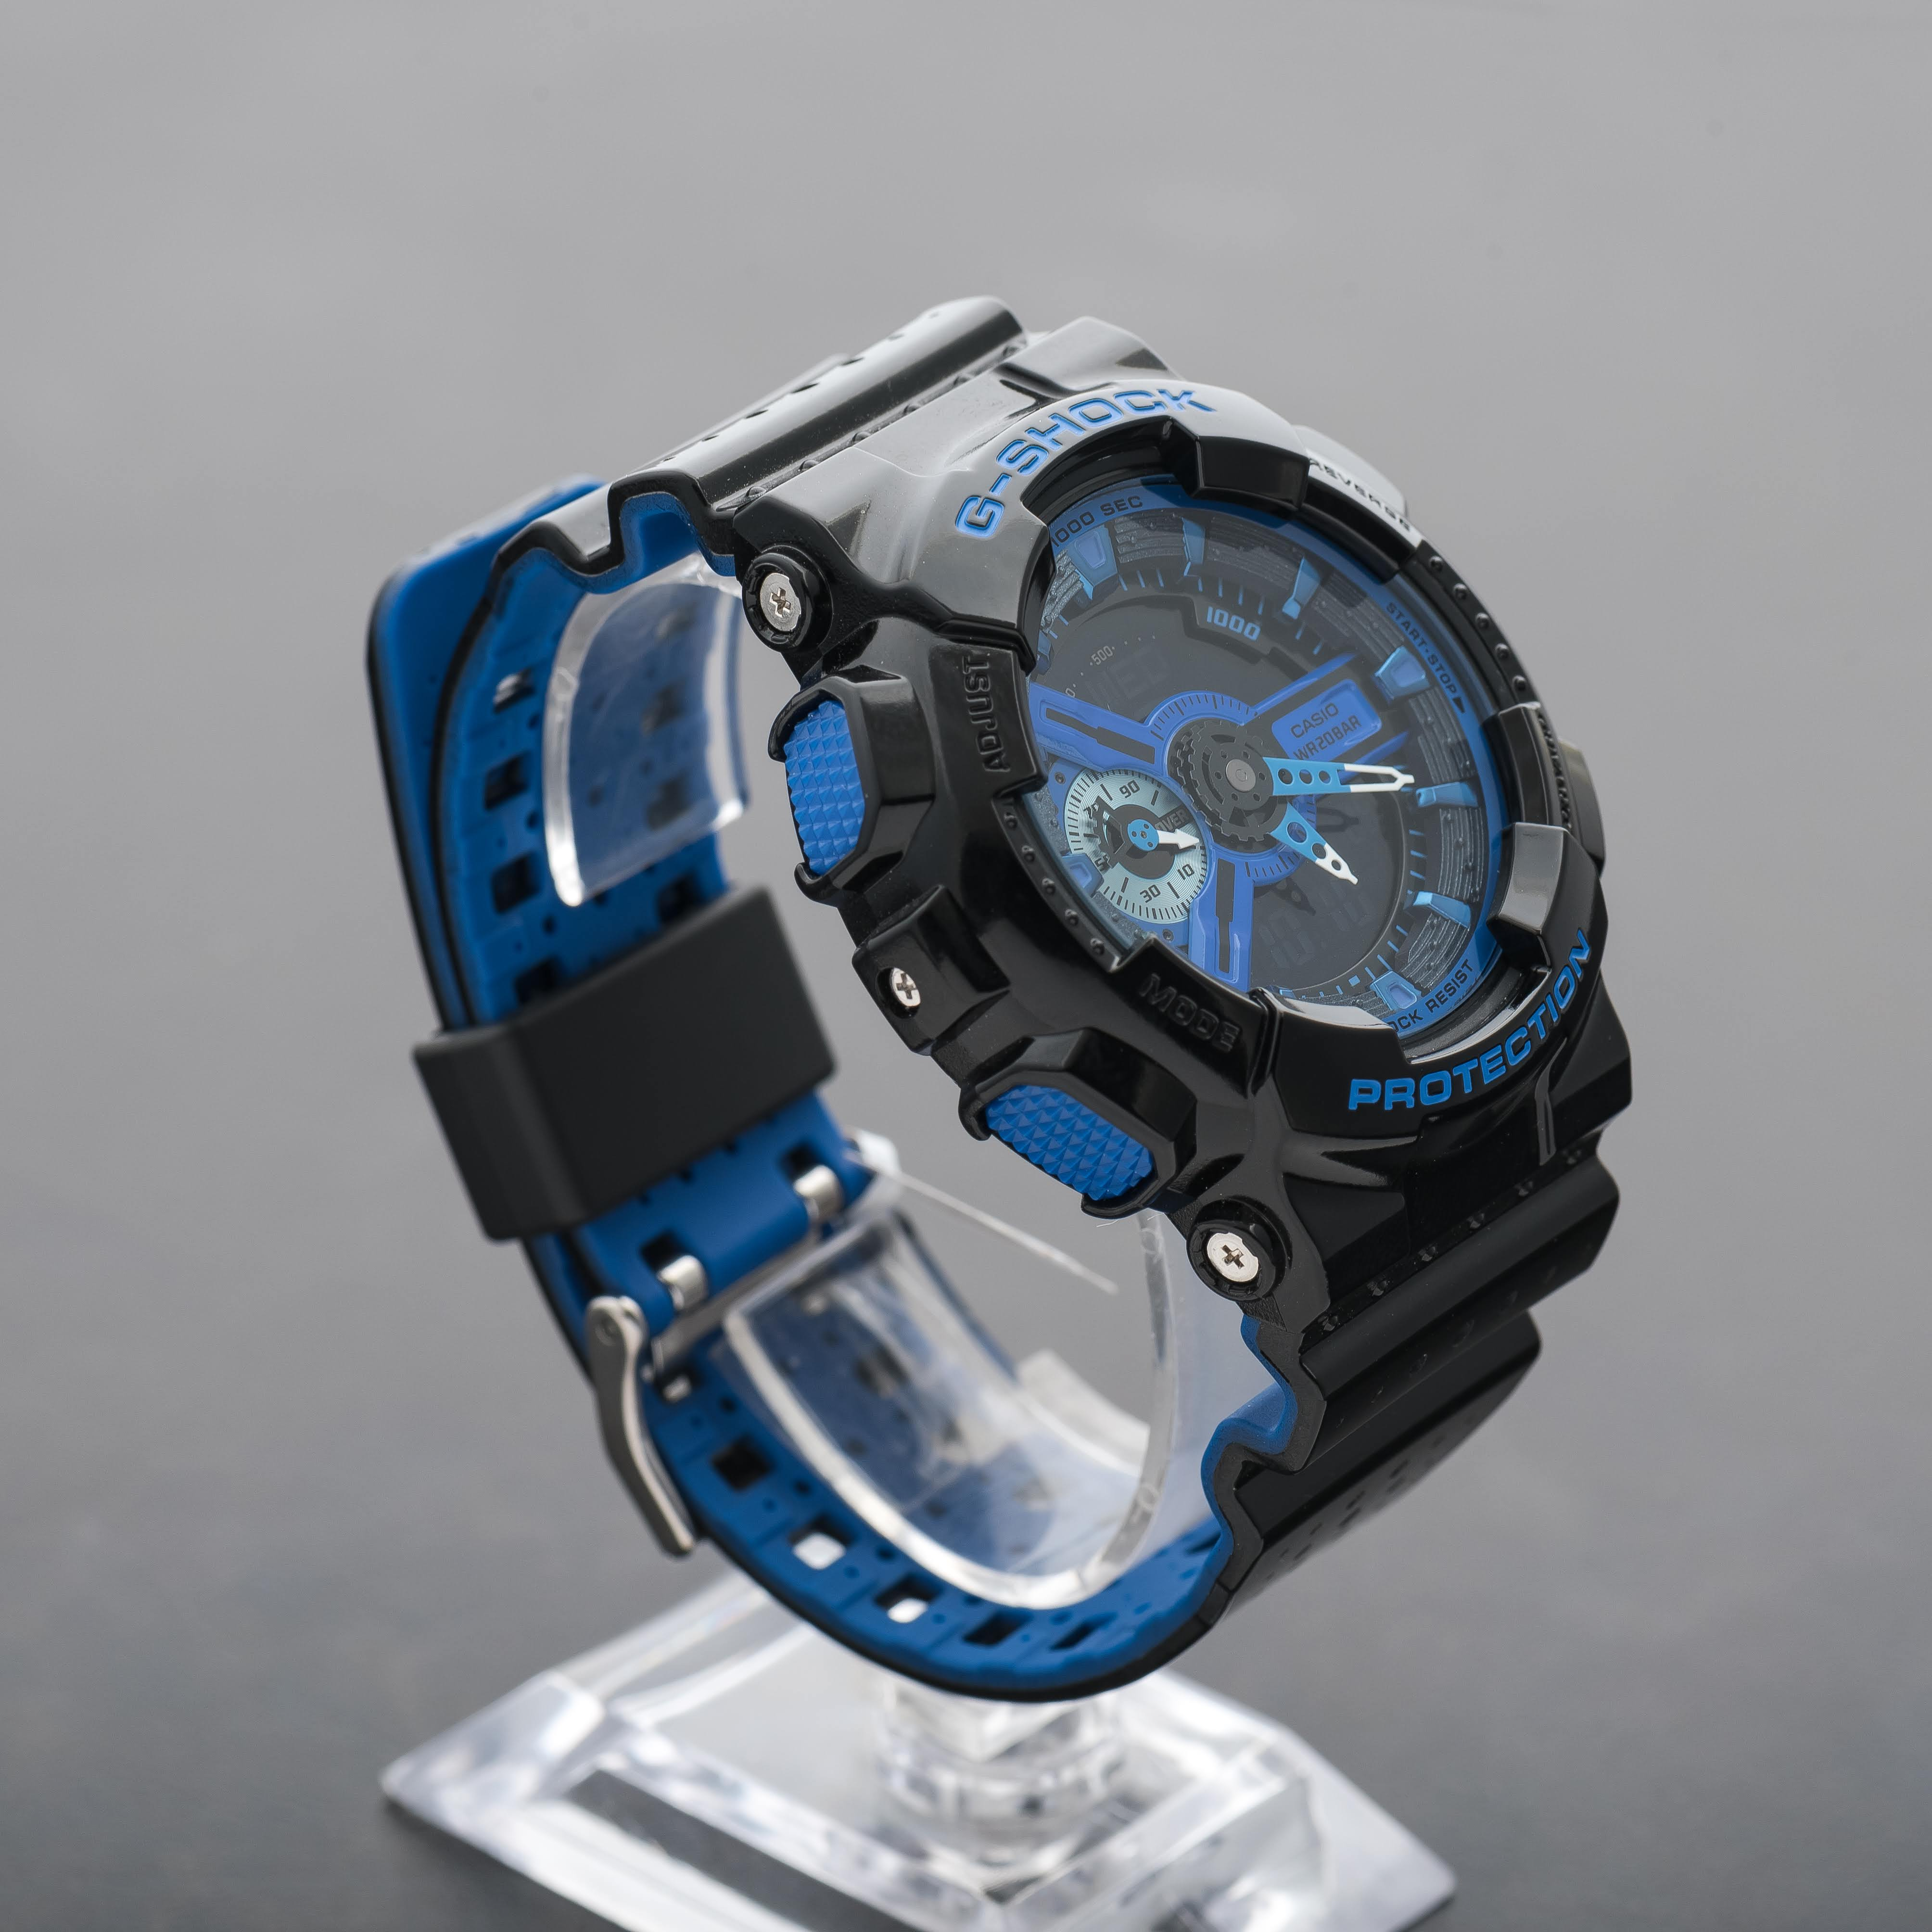 Casio G-Shock Men's Black Blue World Time Alarm Watch GA-110LP-1AER